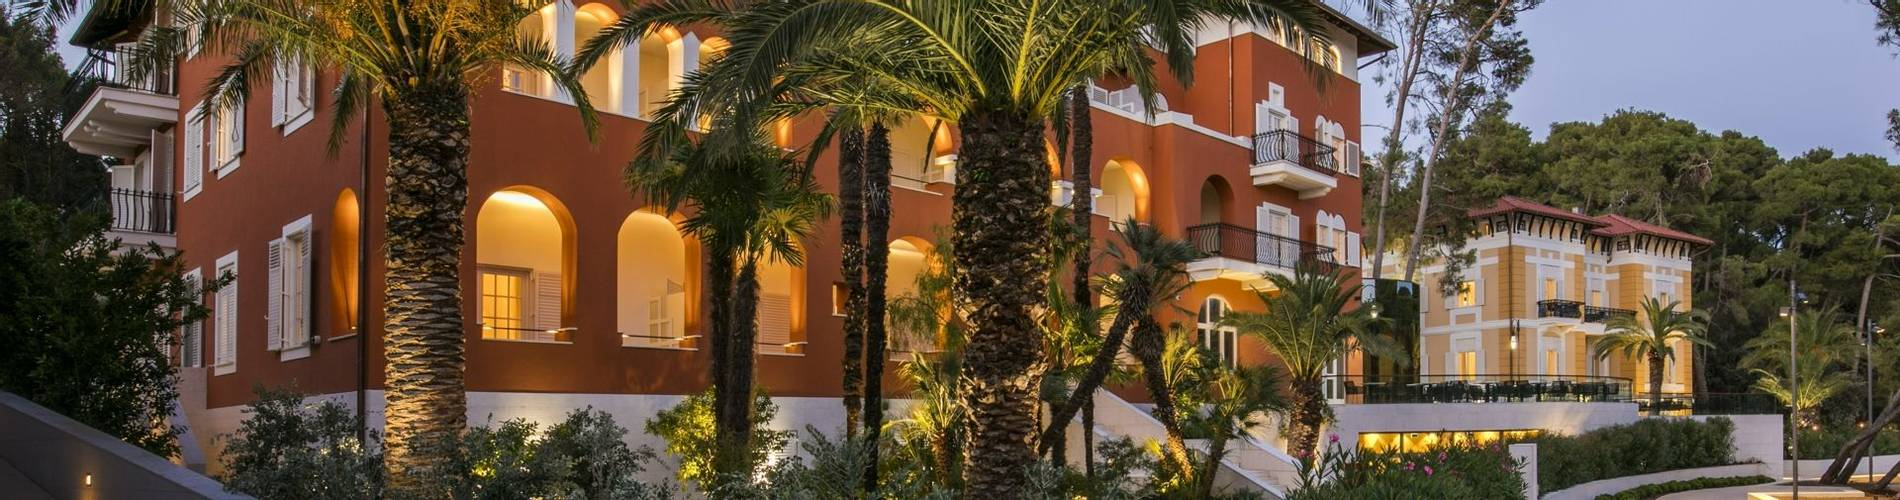 06. Boutique Hotel Alhambra (1).jpg